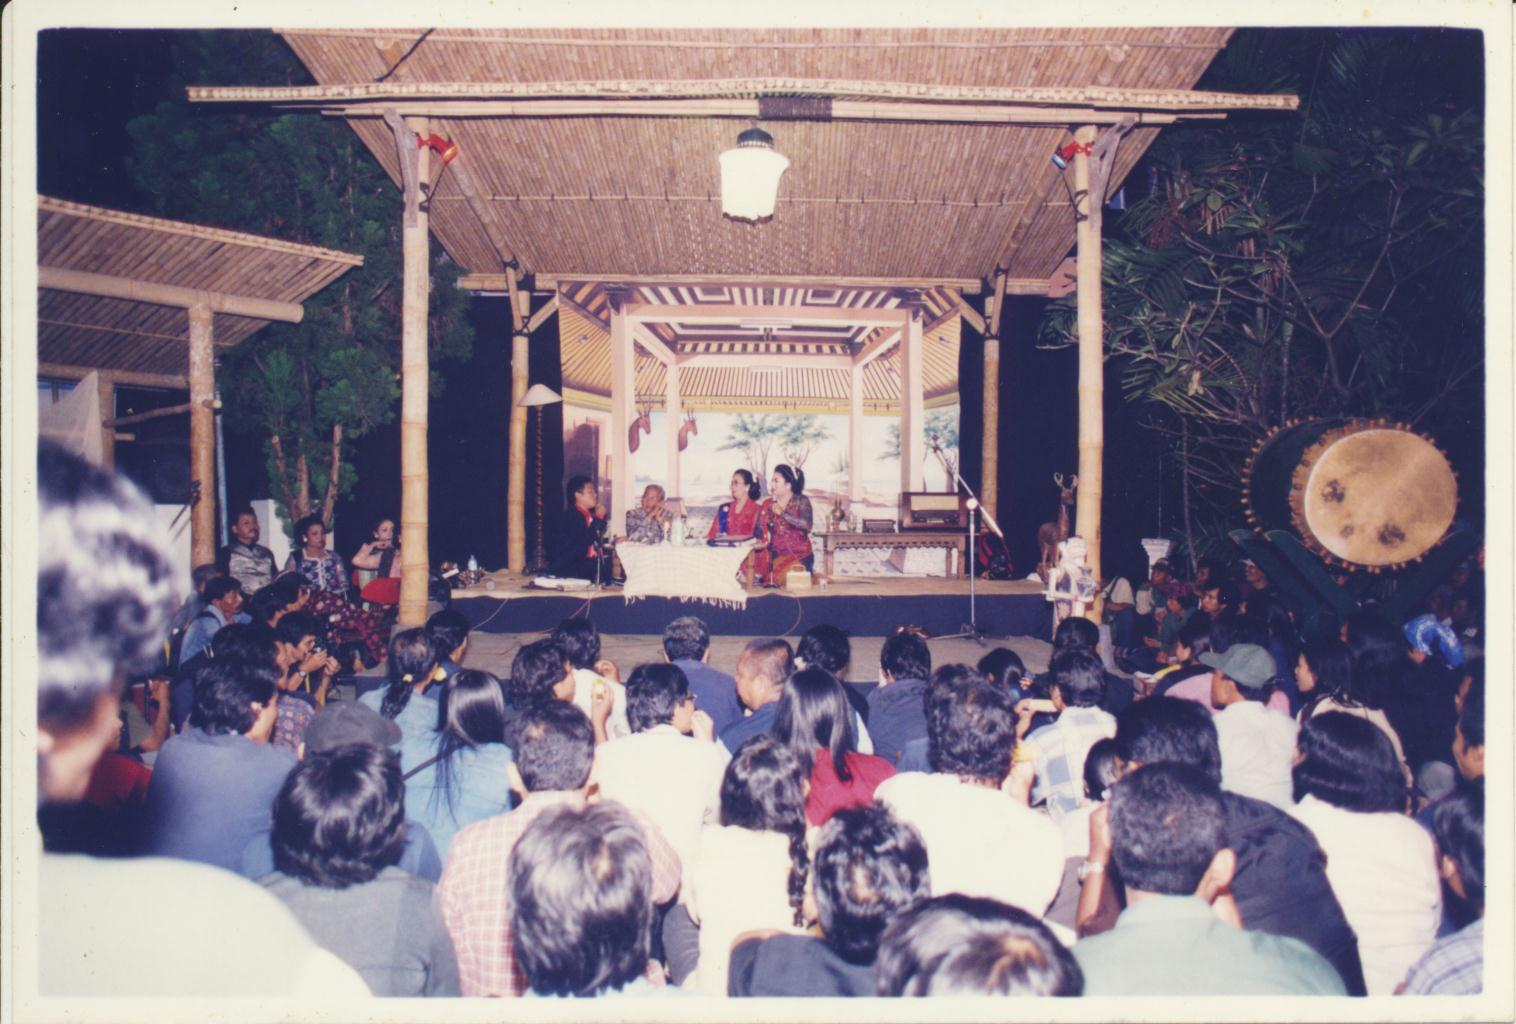 Halaman Bentara Budaya Yogyakarta